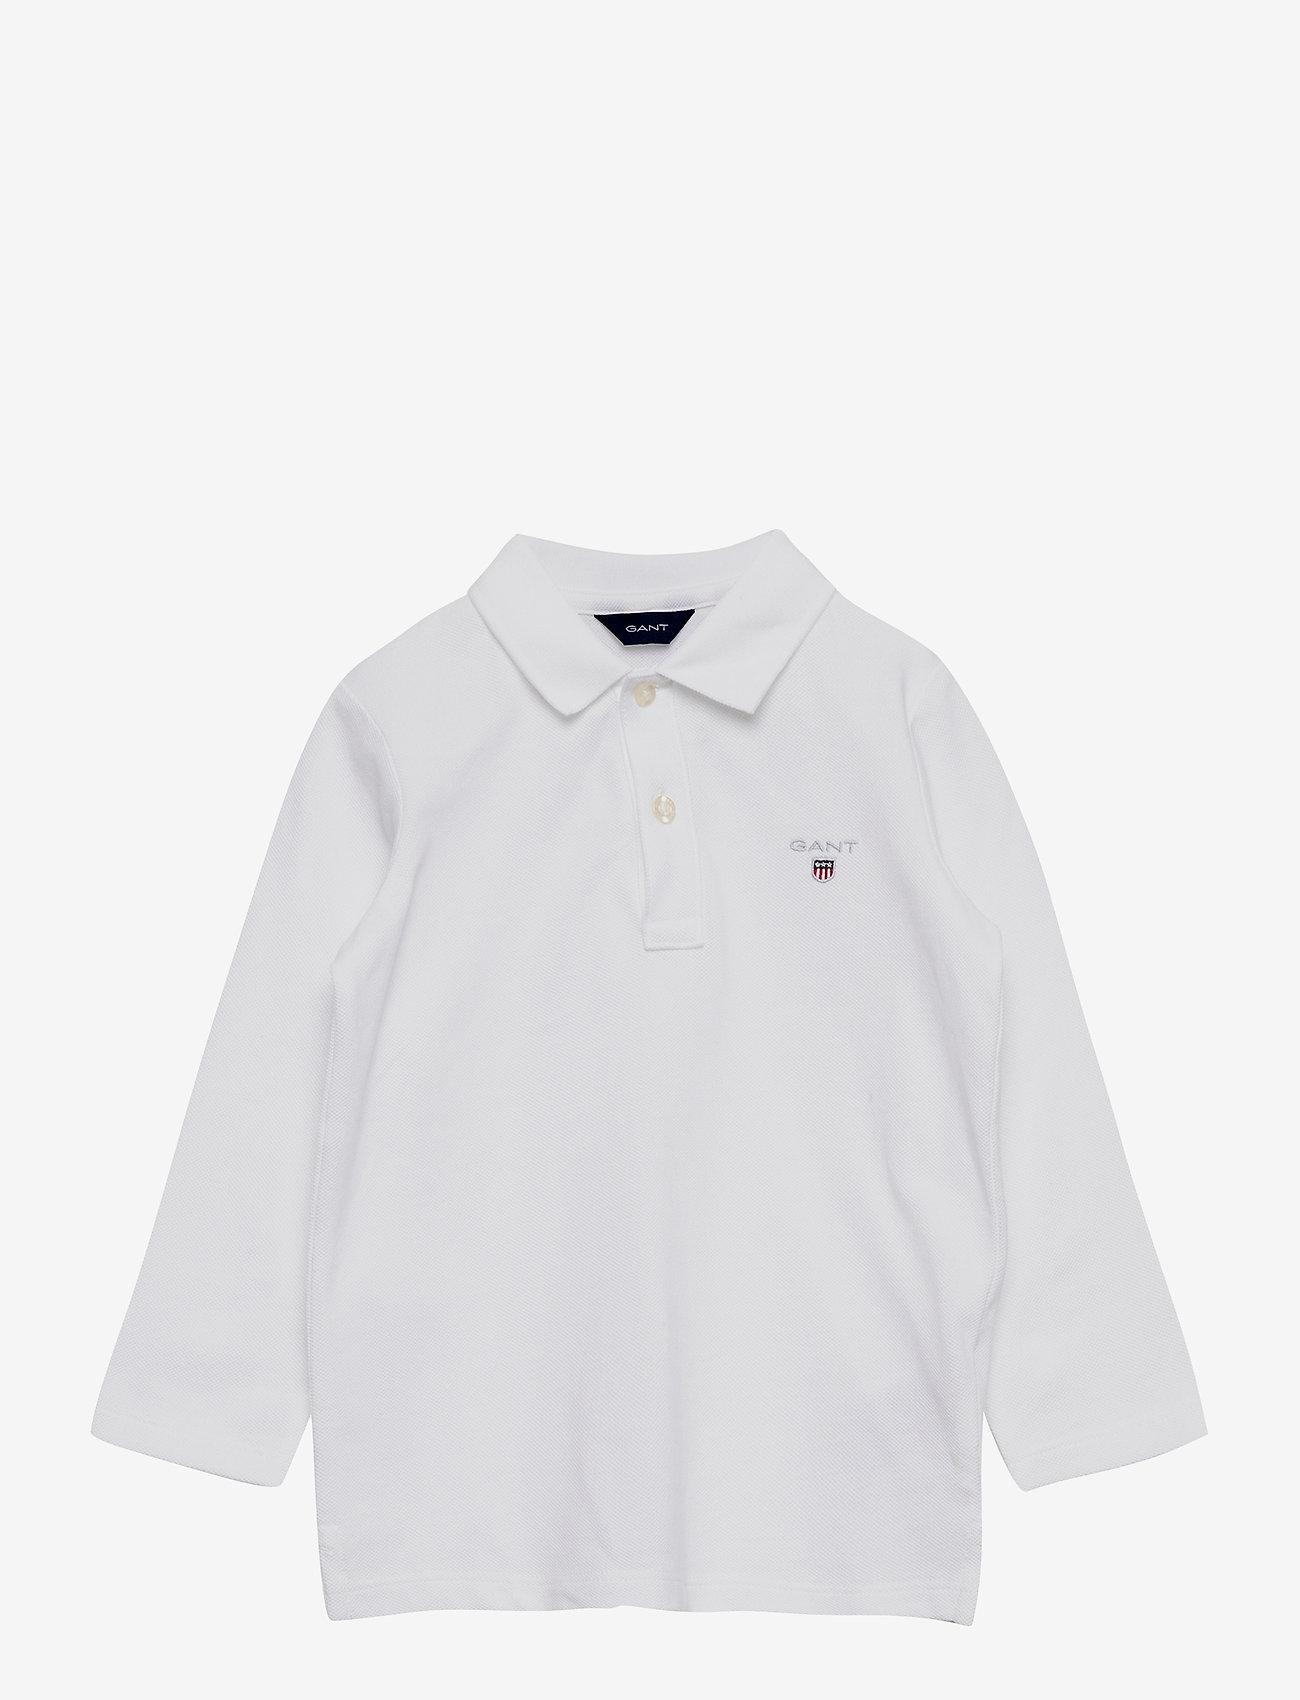 GANT - THE ORIGINAL PIQUE LS RUGGER - polo shirts - white - 0